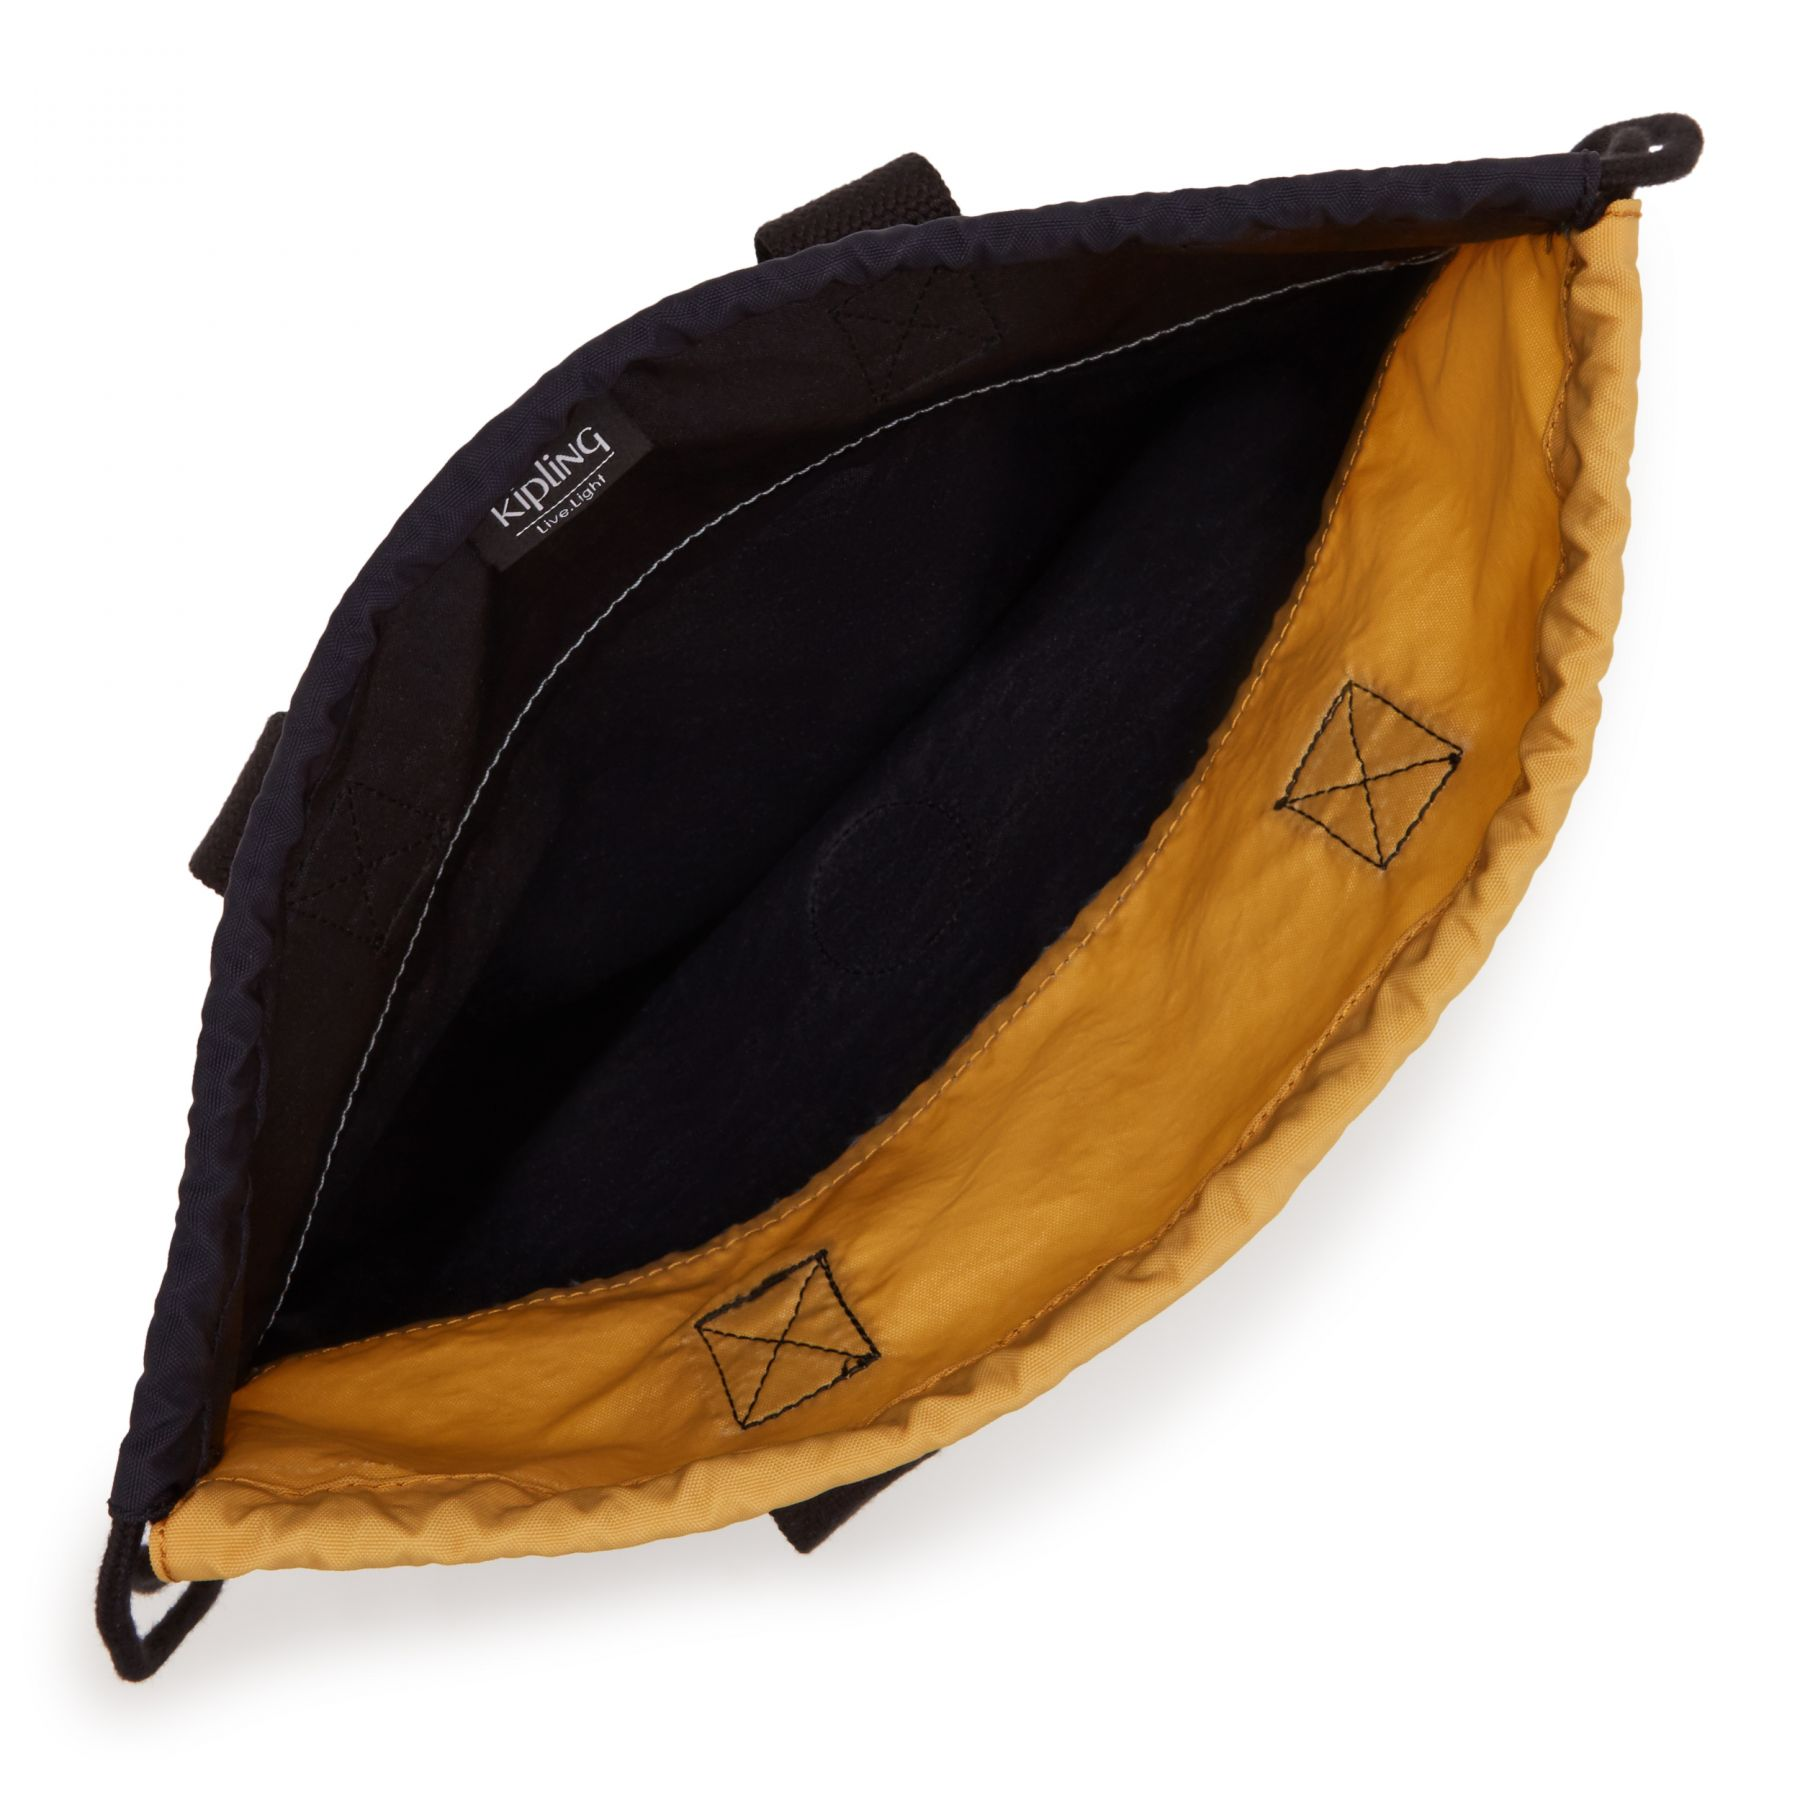 NEW HIPHURRAY BAGS by Kipling - Inside view